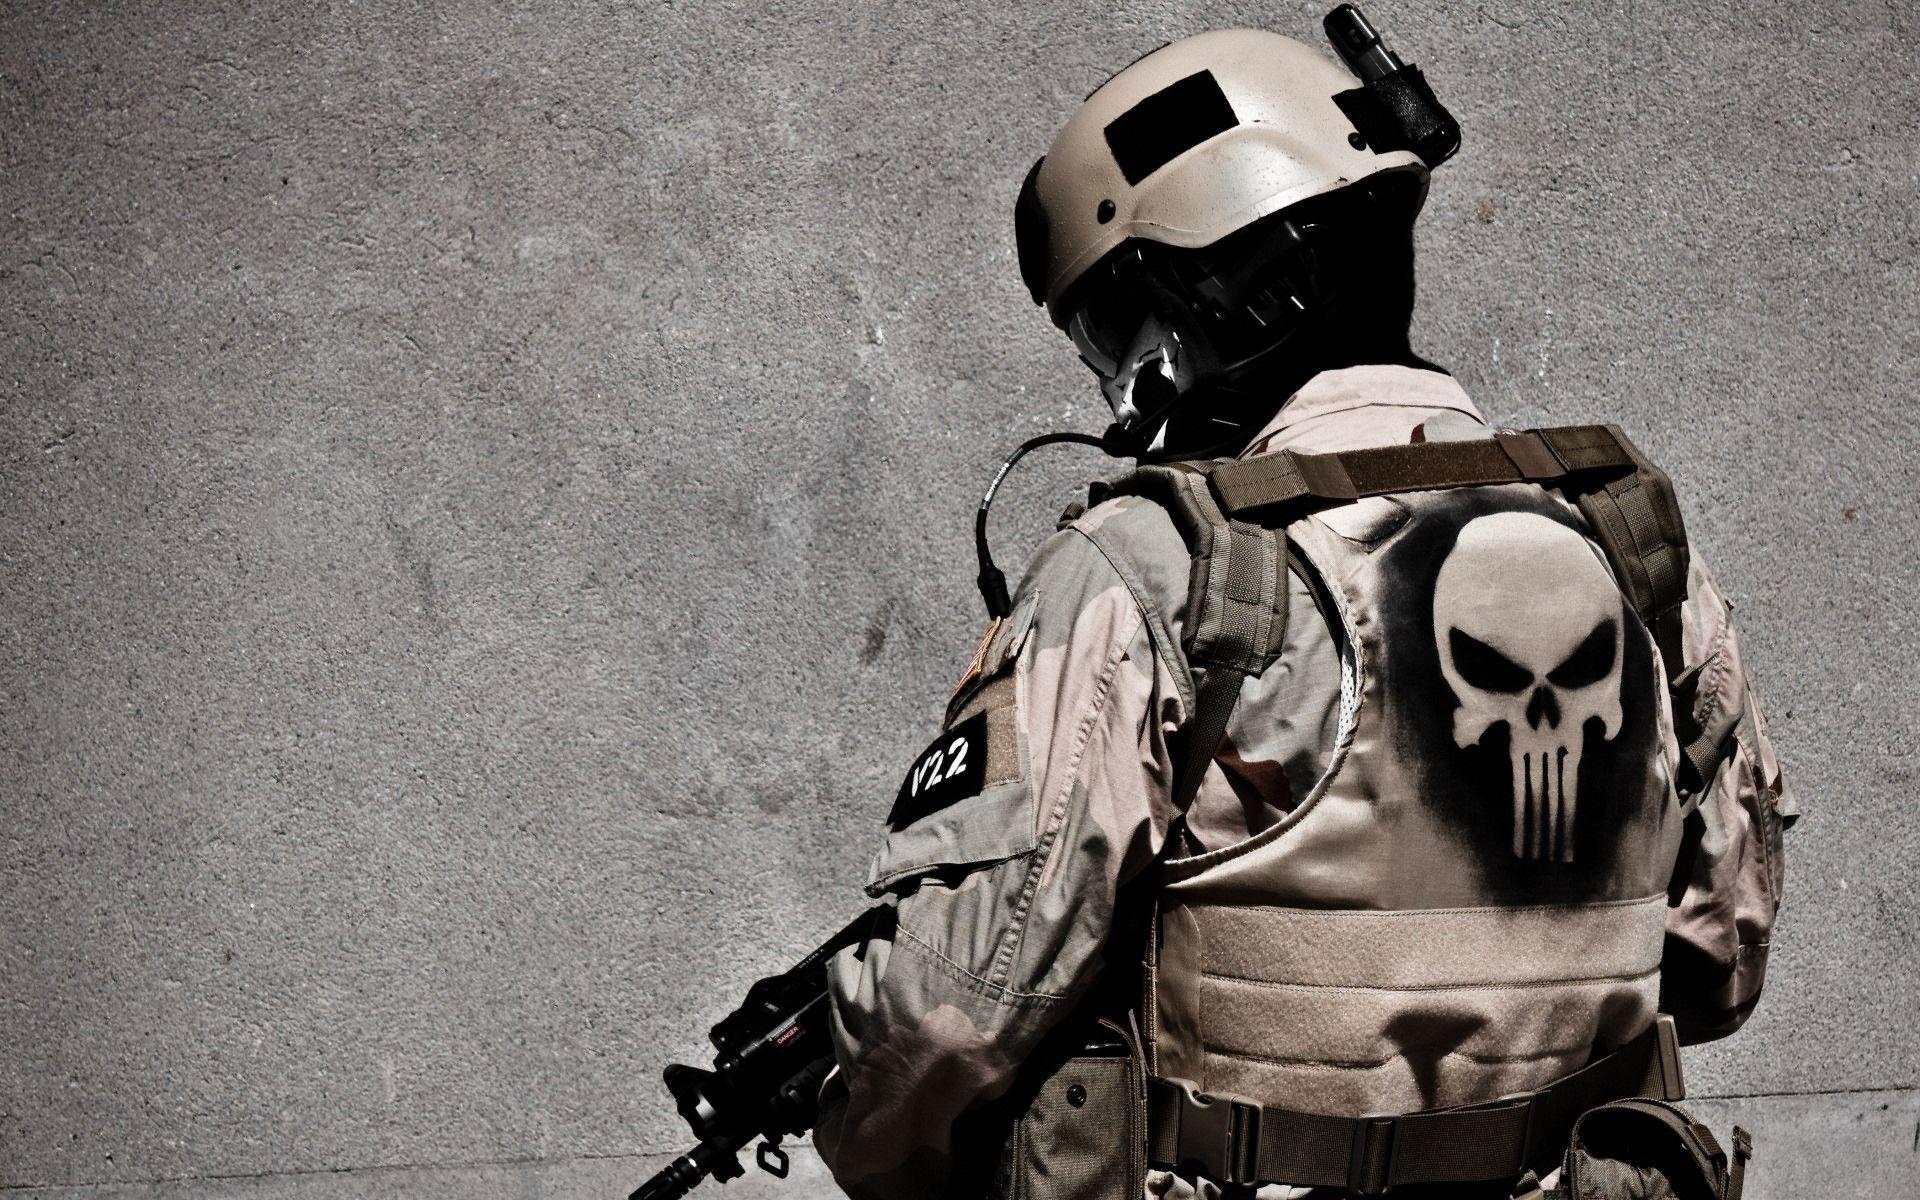 Soilder Military Wallpaper Navy Seal Wallpaper Ghost Soldiers